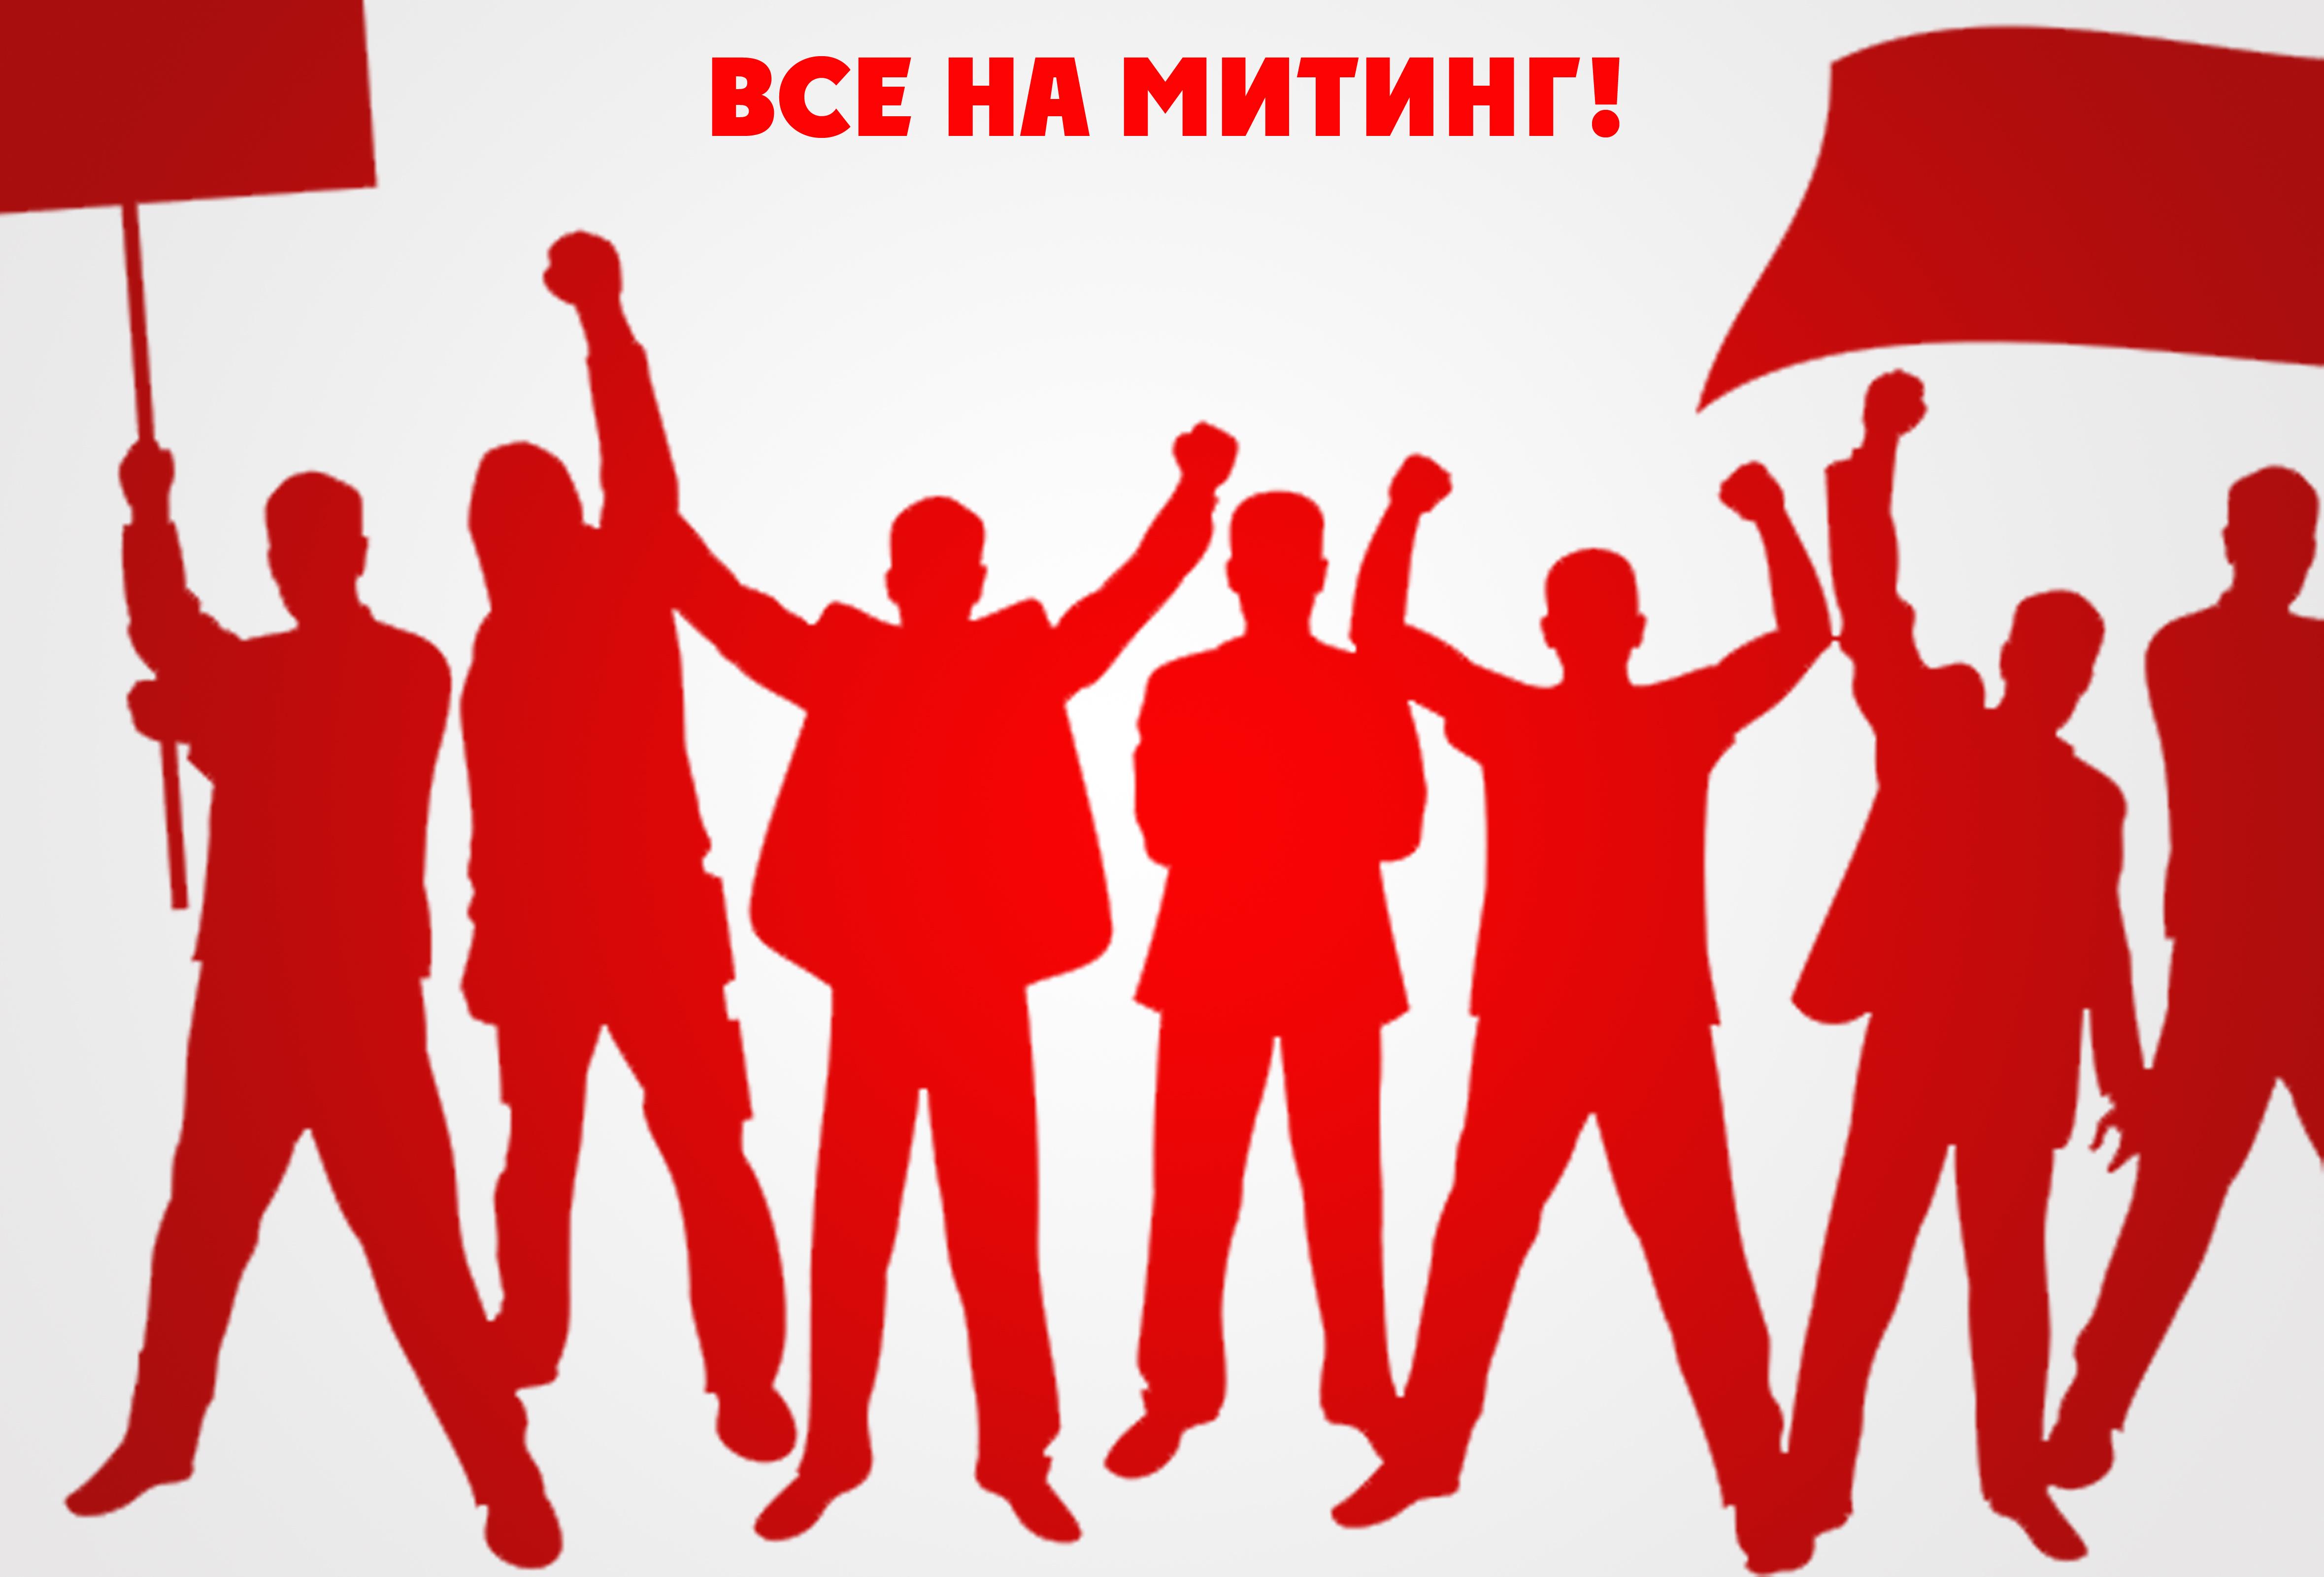 приглашение_на_митинг